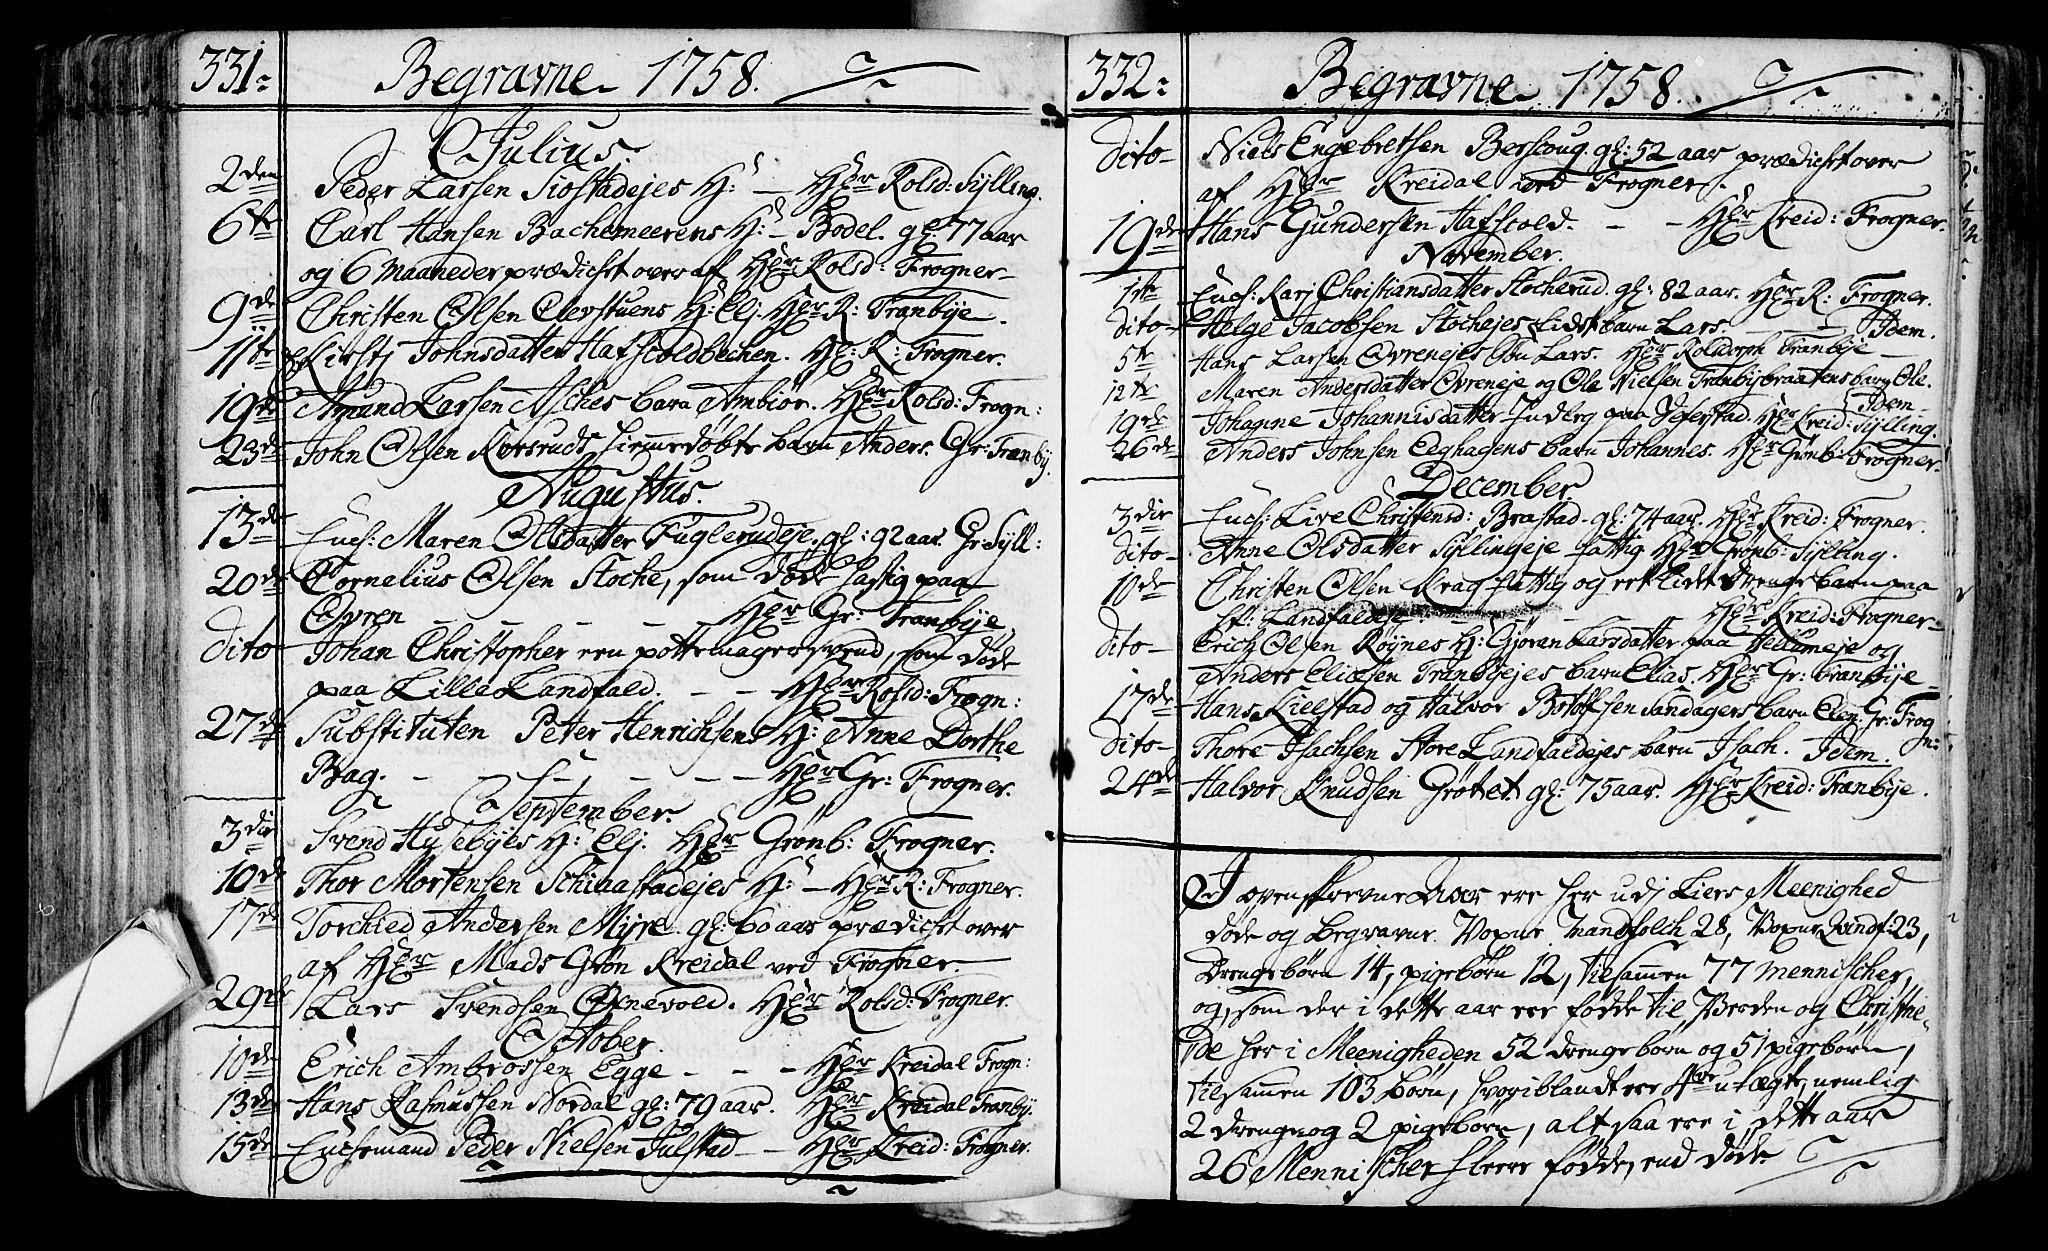 SAKO, Lier kirkebøker, F/Fa/L0004: Ministerialbok nr. I 4, 1749-1764, s. 331-332